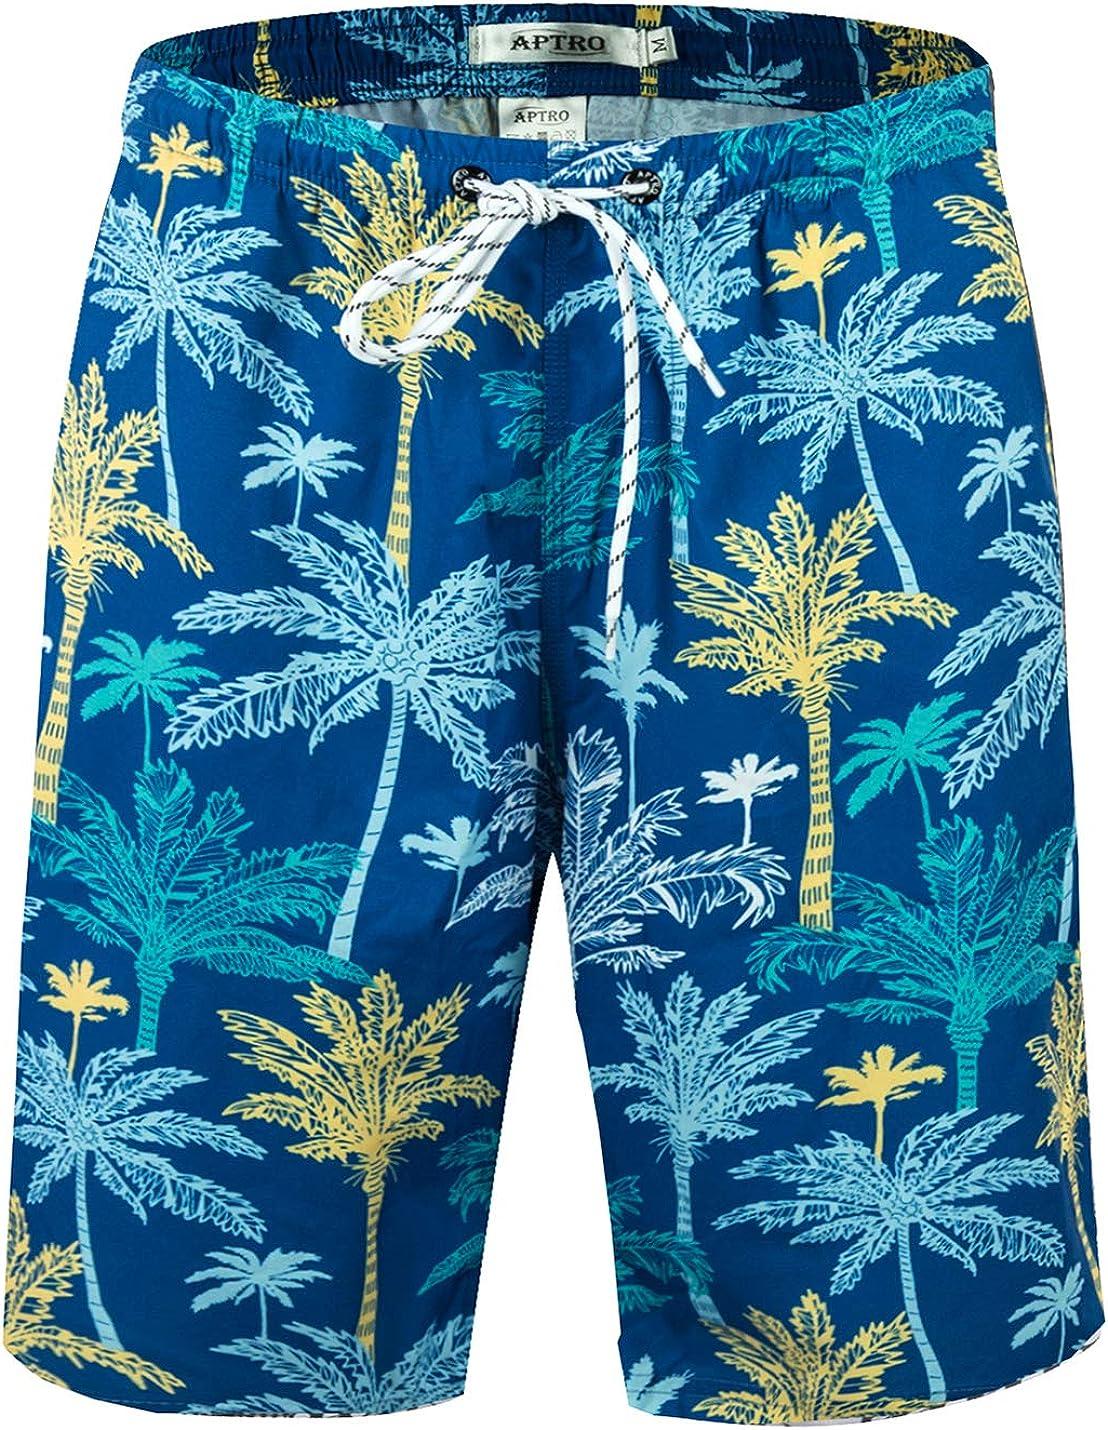 APTRO Mens Swim Trunks Quick Dry Bathing Suit Elastic Waistband Swim Shorts